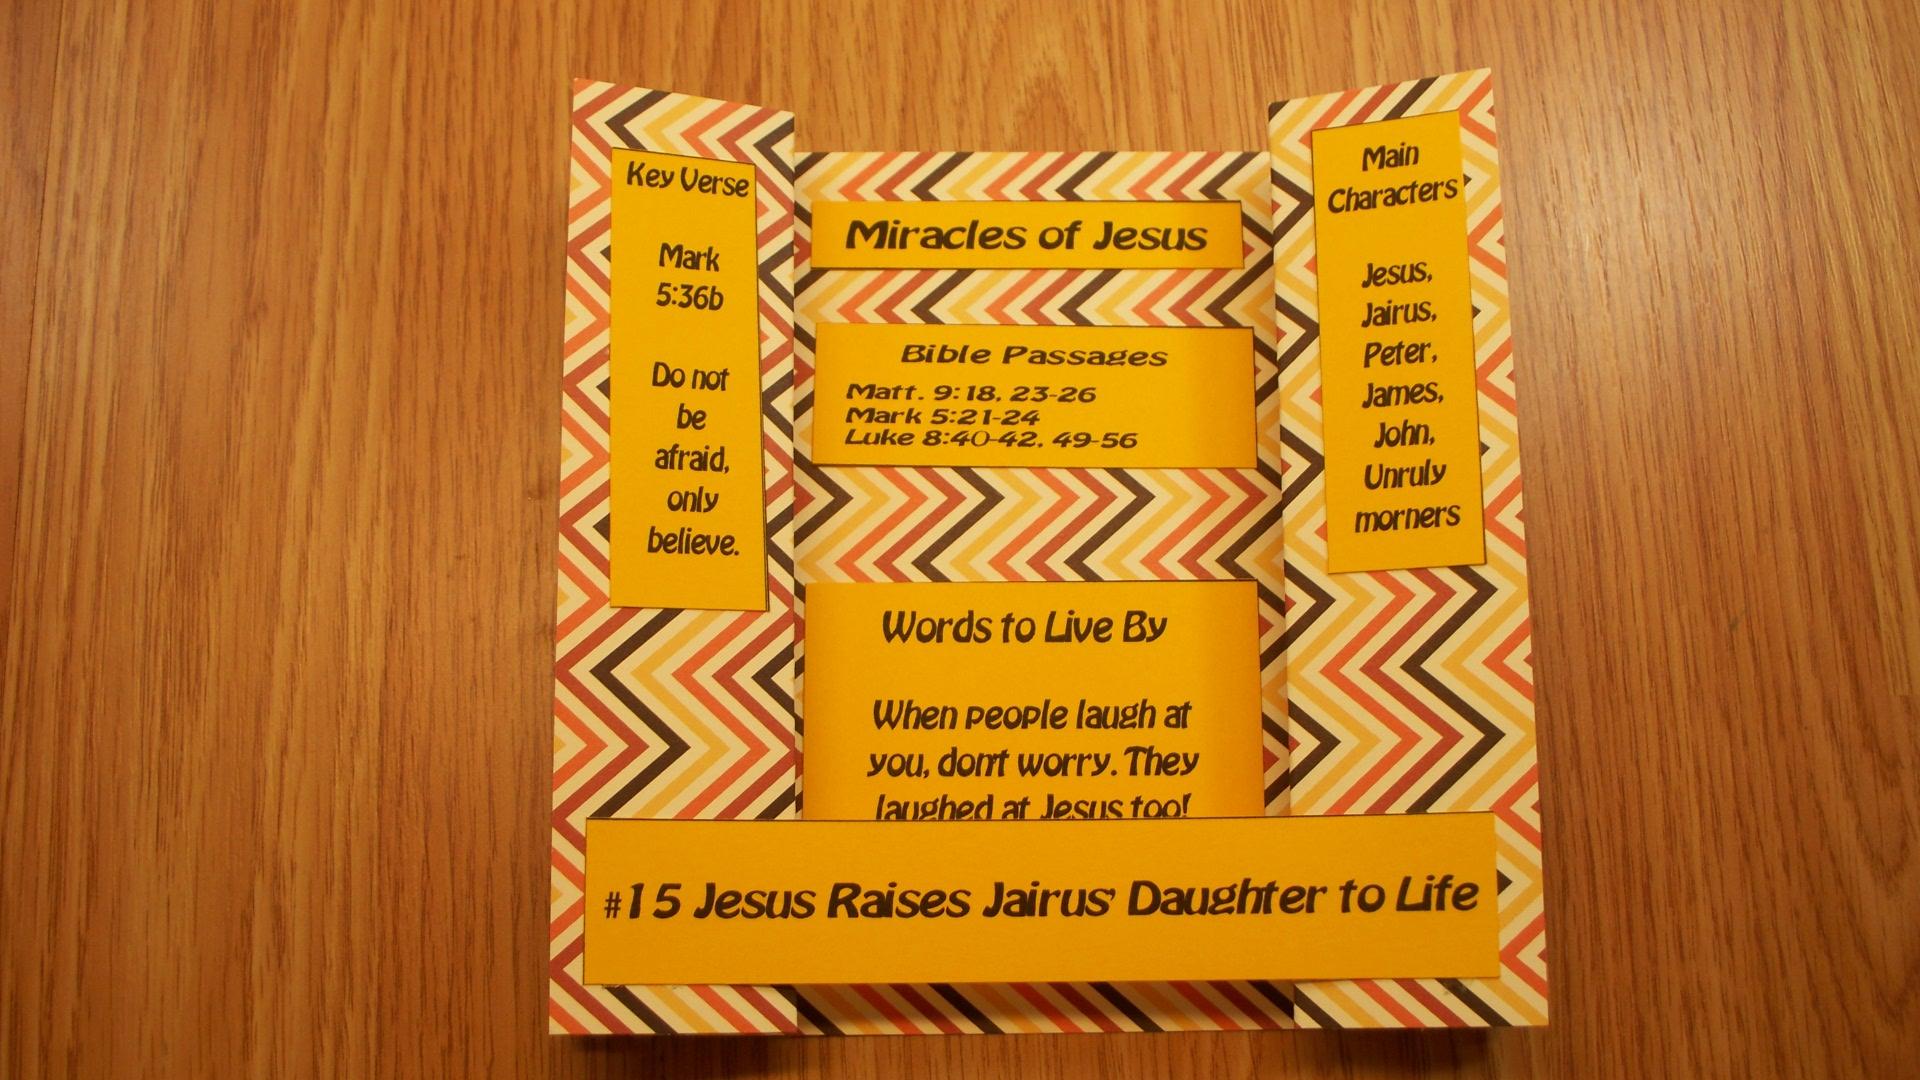 #15 Jesus Raises Jarius Daughter To Life